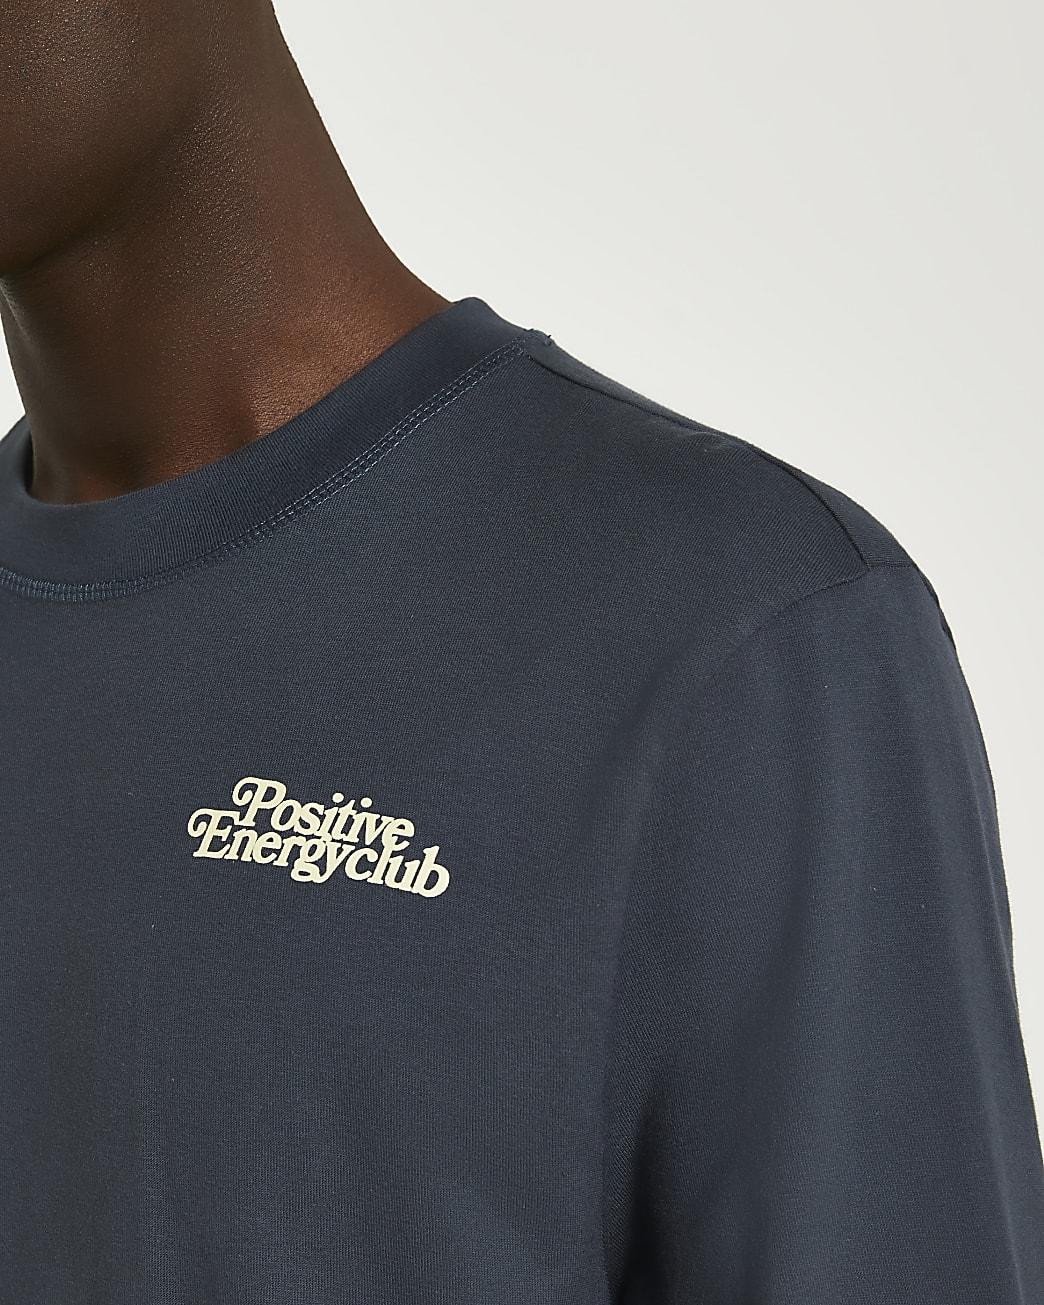 Grey graphic long sleeve t-shirt